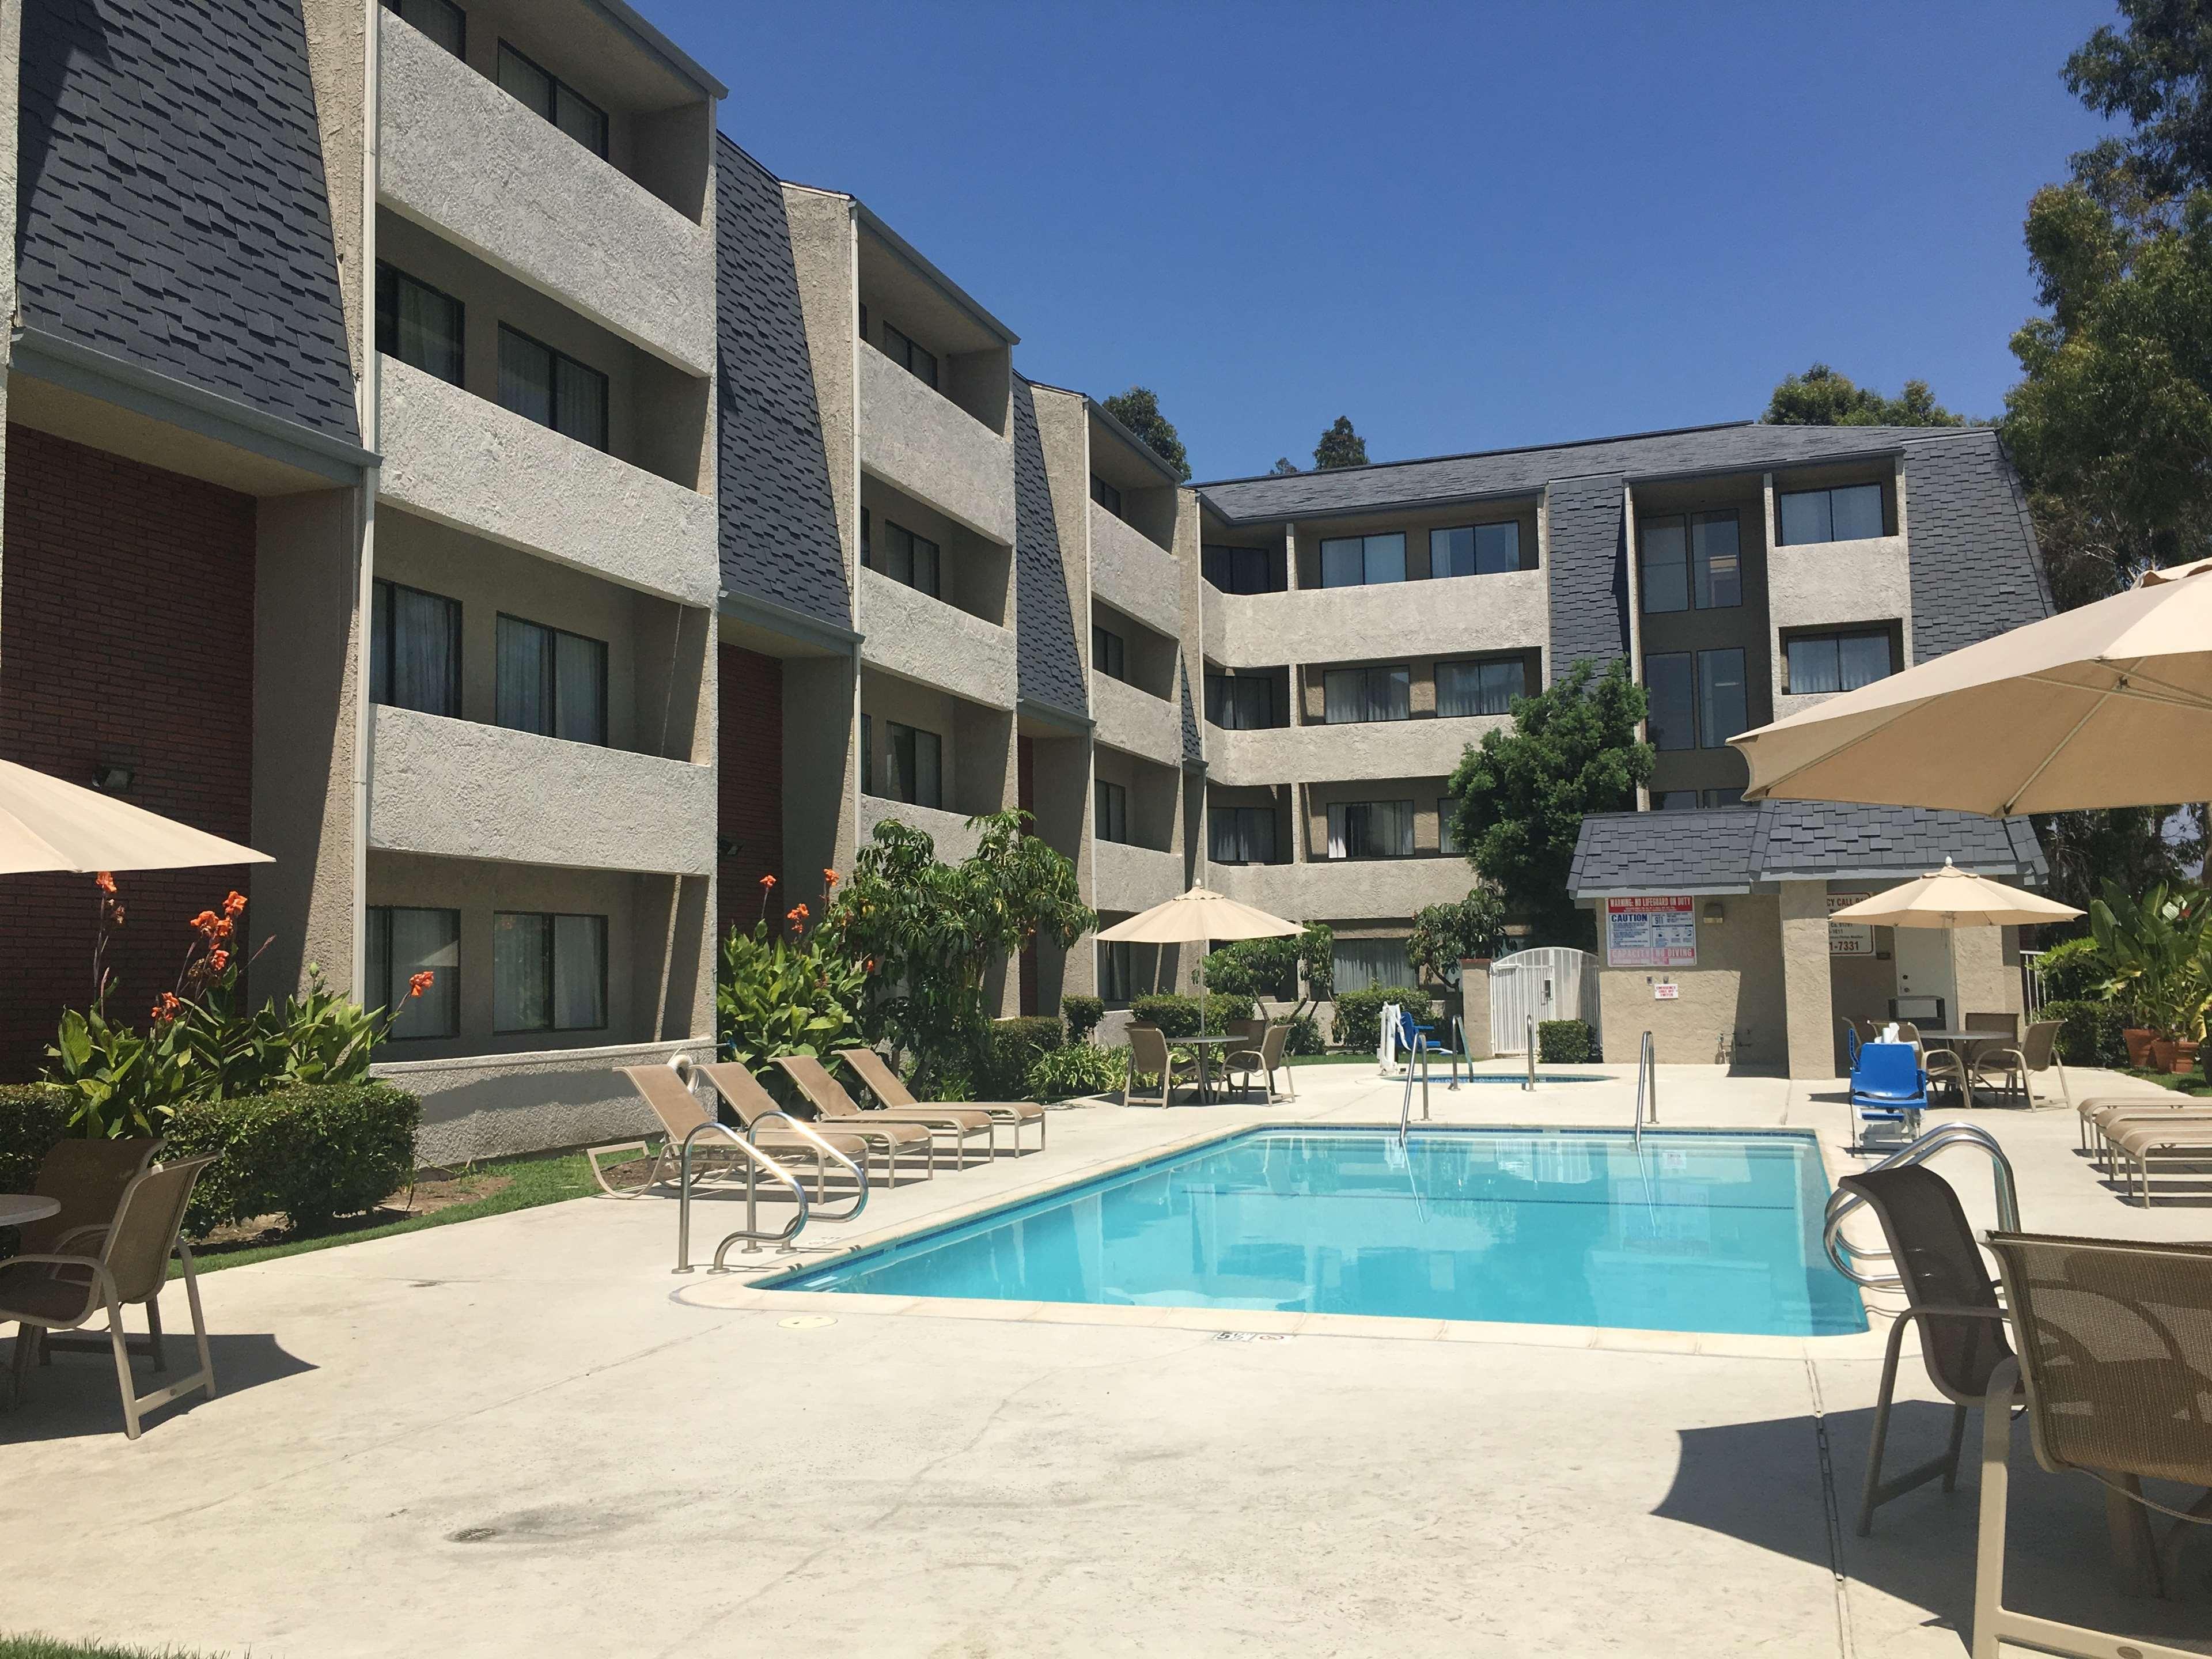 West Covina Hotels Motels